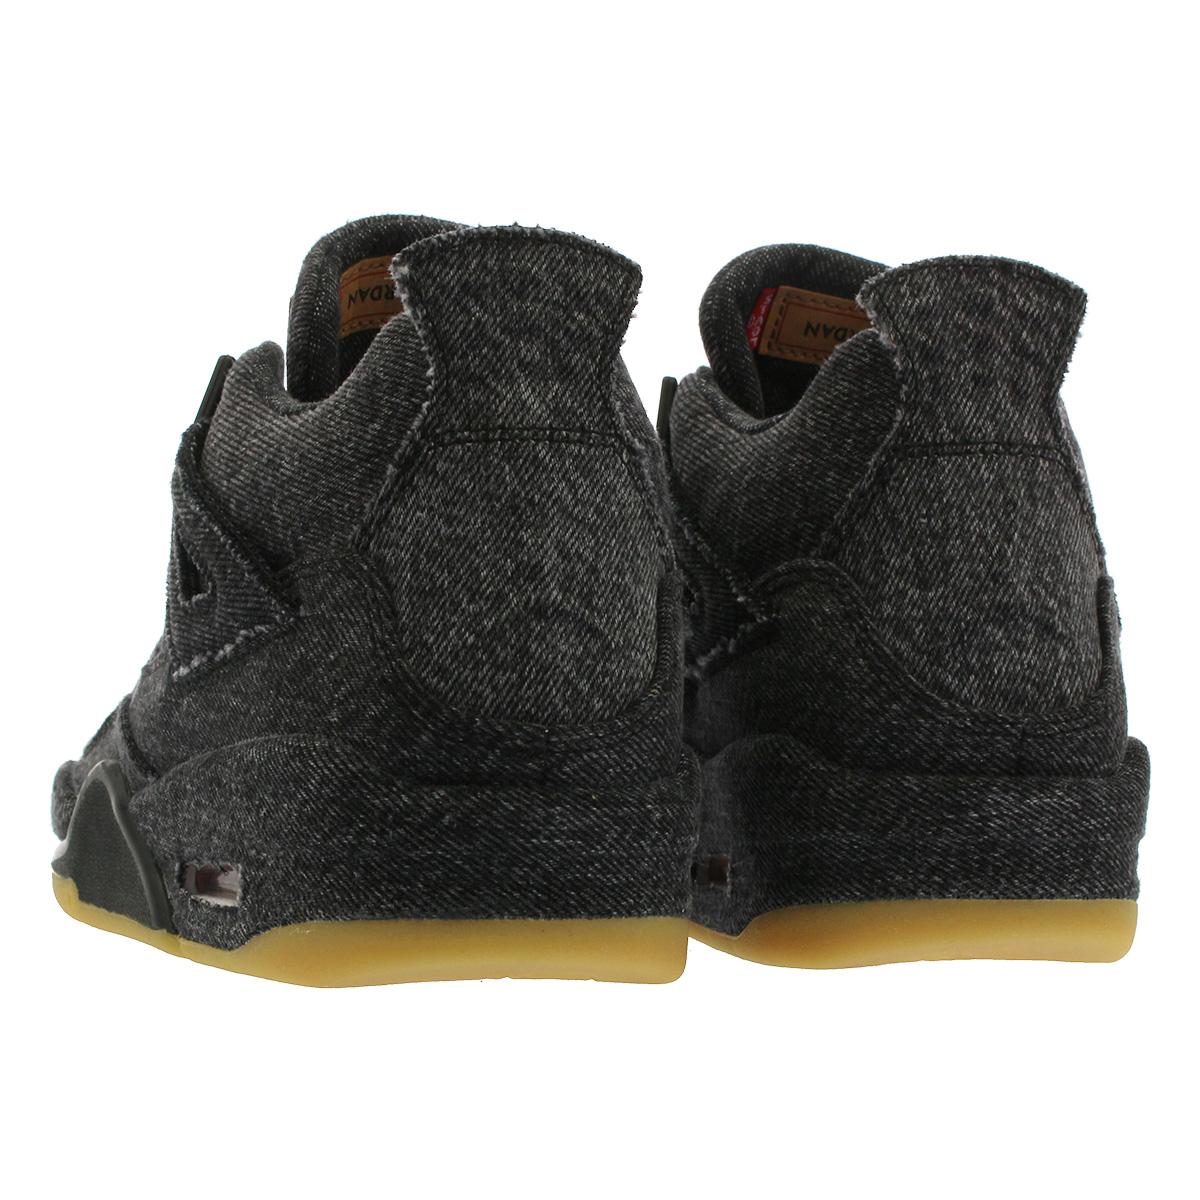 best sneakers 9d986 fac5f NIKE AIR JORDAN 4 RETRO BG Nike air Jordan 4 nostalgic BG Levis BLACK/BLACK  aq9103-001